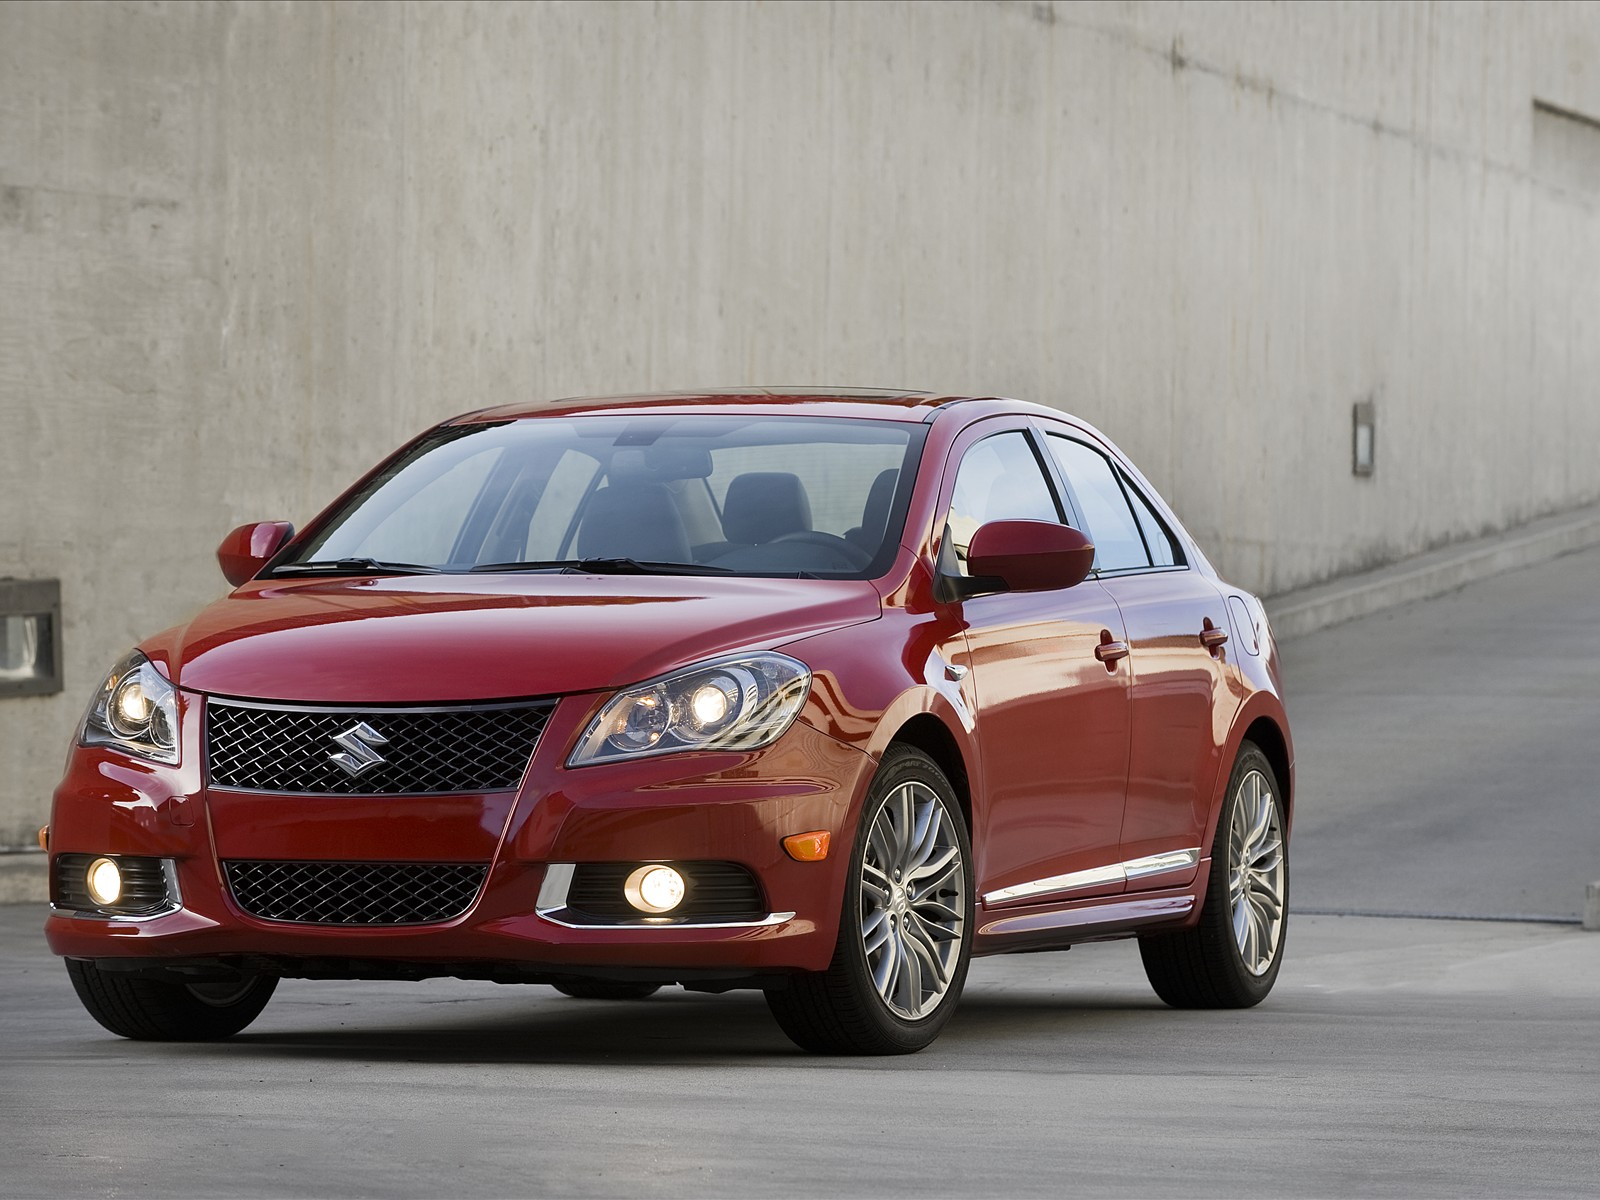 auto cars new 2011 - photo #2